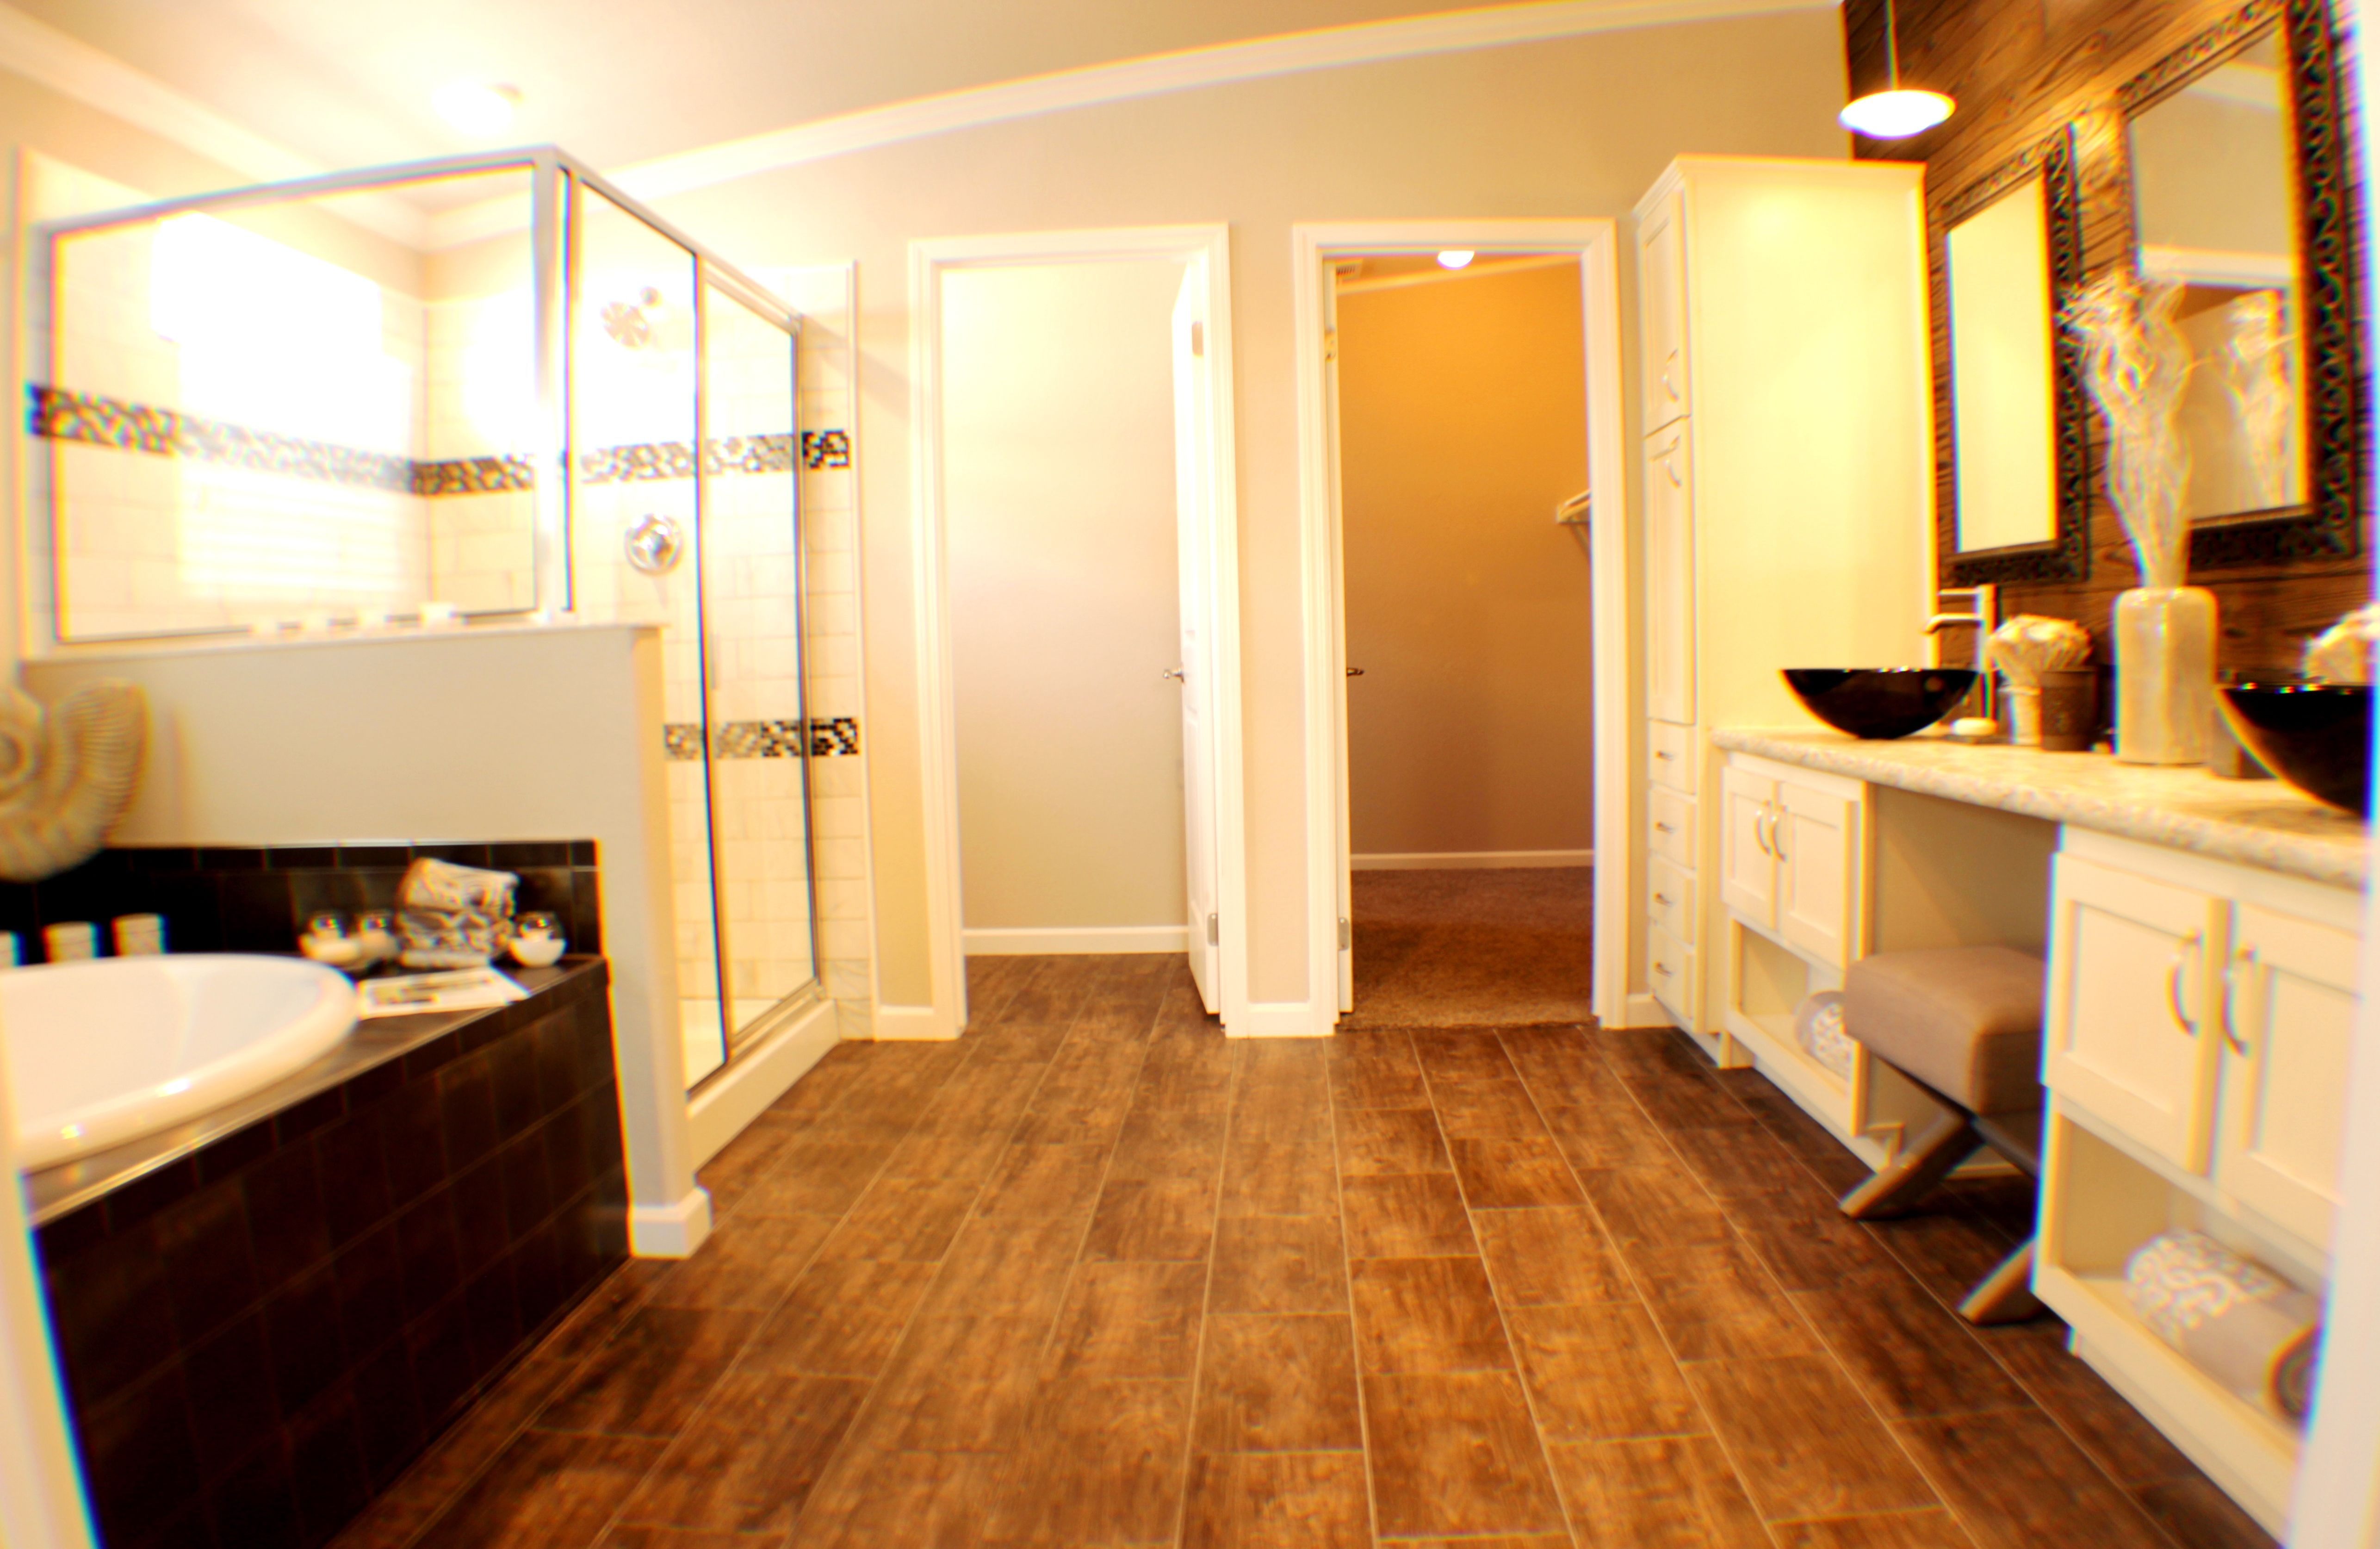 Serenity Spa Baths, Quality Low Priced Modular Homes & Mobile Homes ...